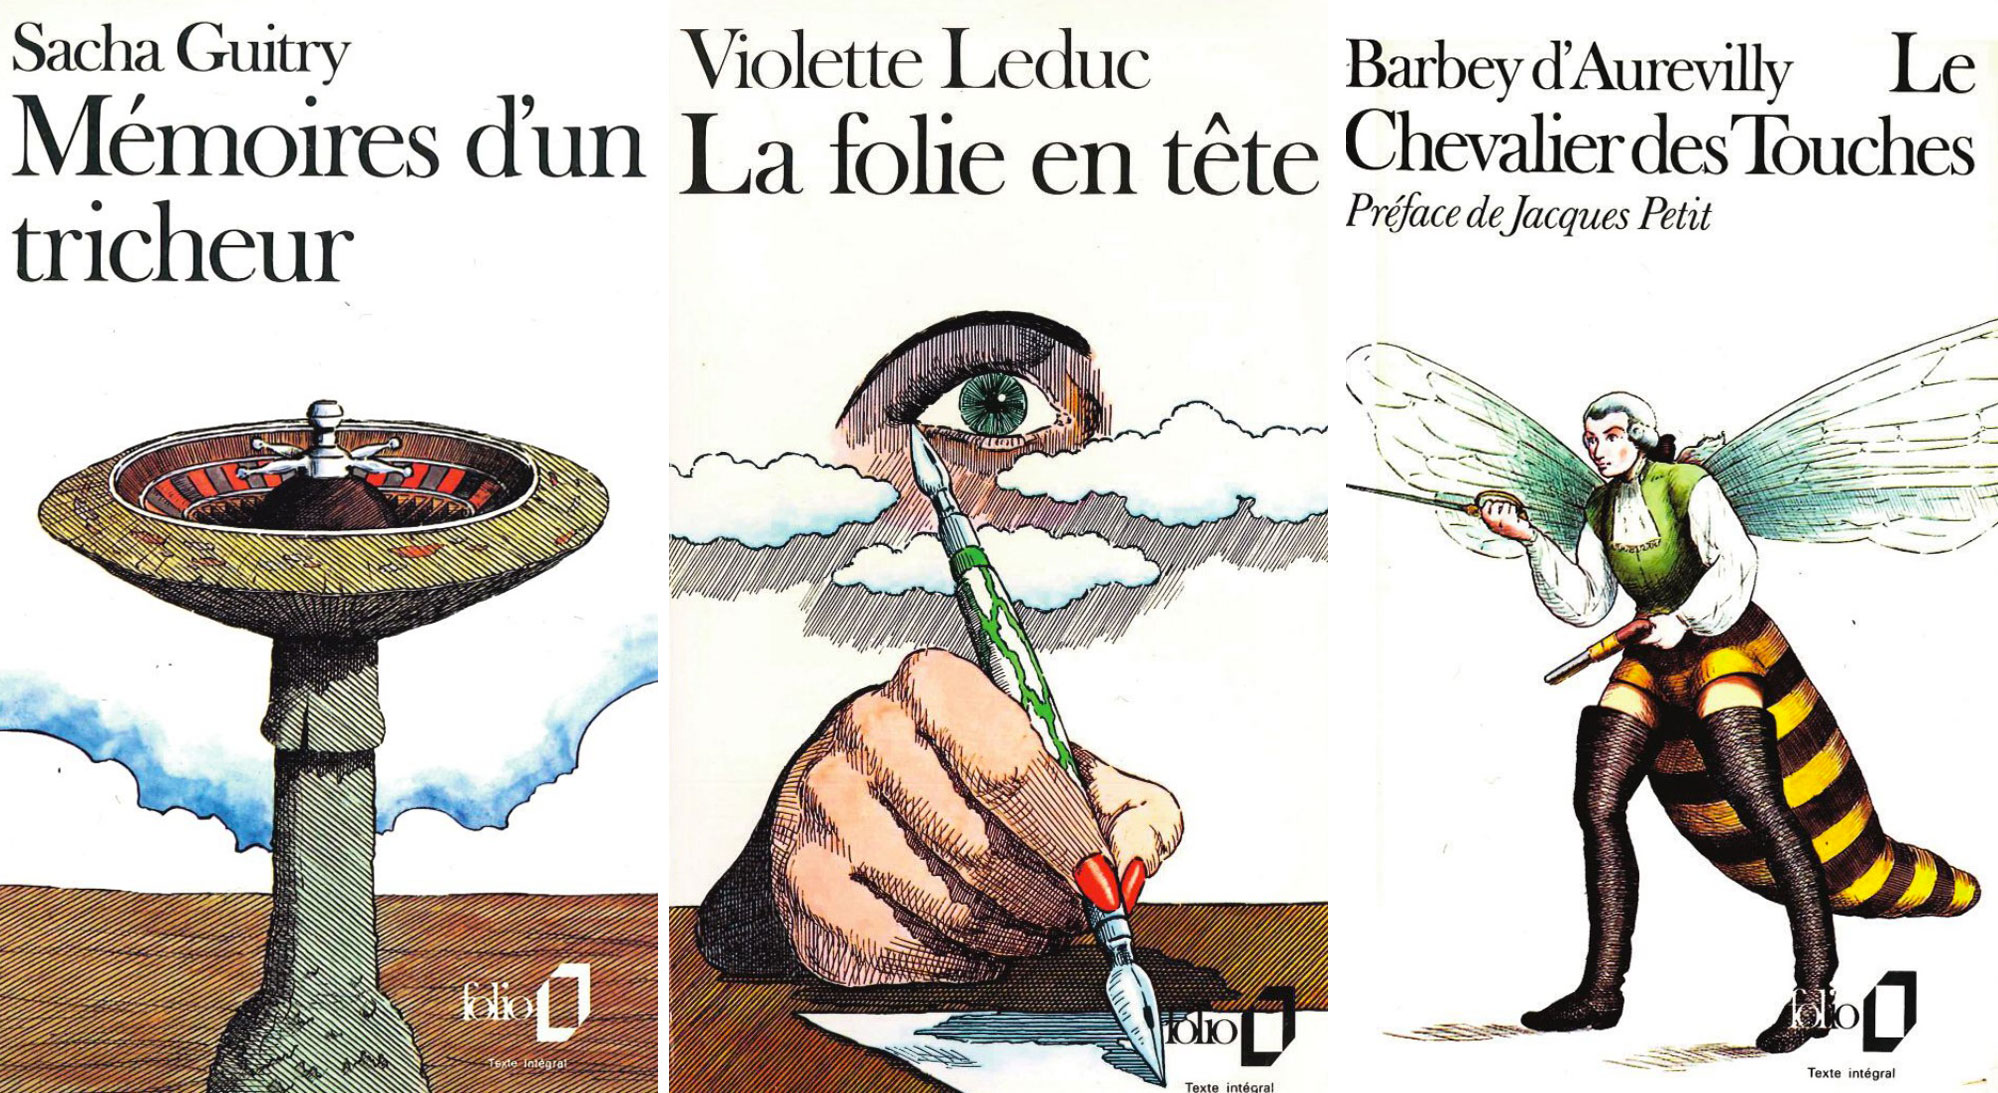 Jean-Alessandrini-couvertures-folio-01